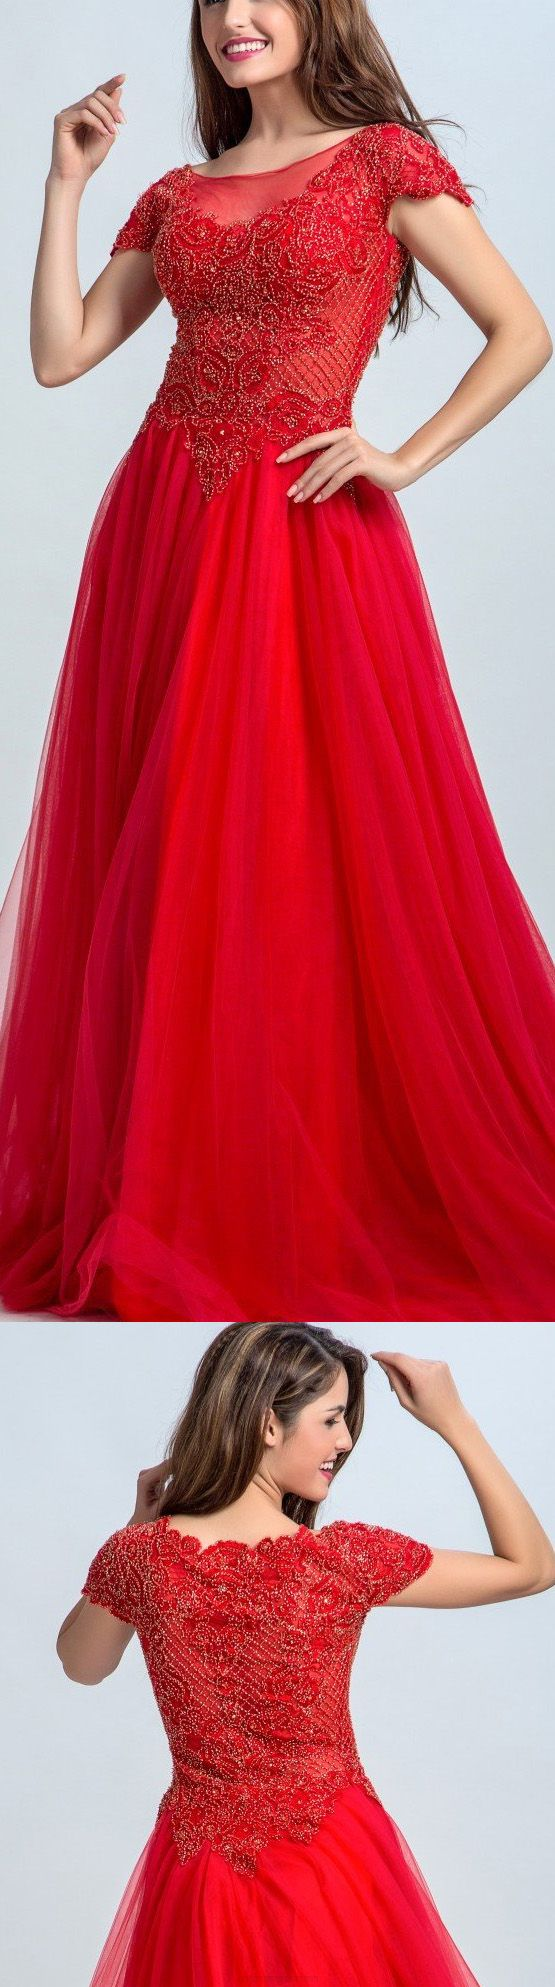 Long Prom Dresses 2017, Red Prom Dresses, Prom Dresses 2017, Short Prom Dresses, Long Sleeve Prom Dresses, Long Prom Dresses, 2017 Prom Dresses, Pretty Prom Dresses, Long Red Prom Dresses, Prom Dresses Red, Long Sleeve Dresses, Short Sleeve Prom Dresses, Red Short Sleeve Evening Dresses, Long Evening Dresses, Red Color A-line Scoop Short Sleeve Floor-length Tulle Pretty Prom Dress/Evening Dress